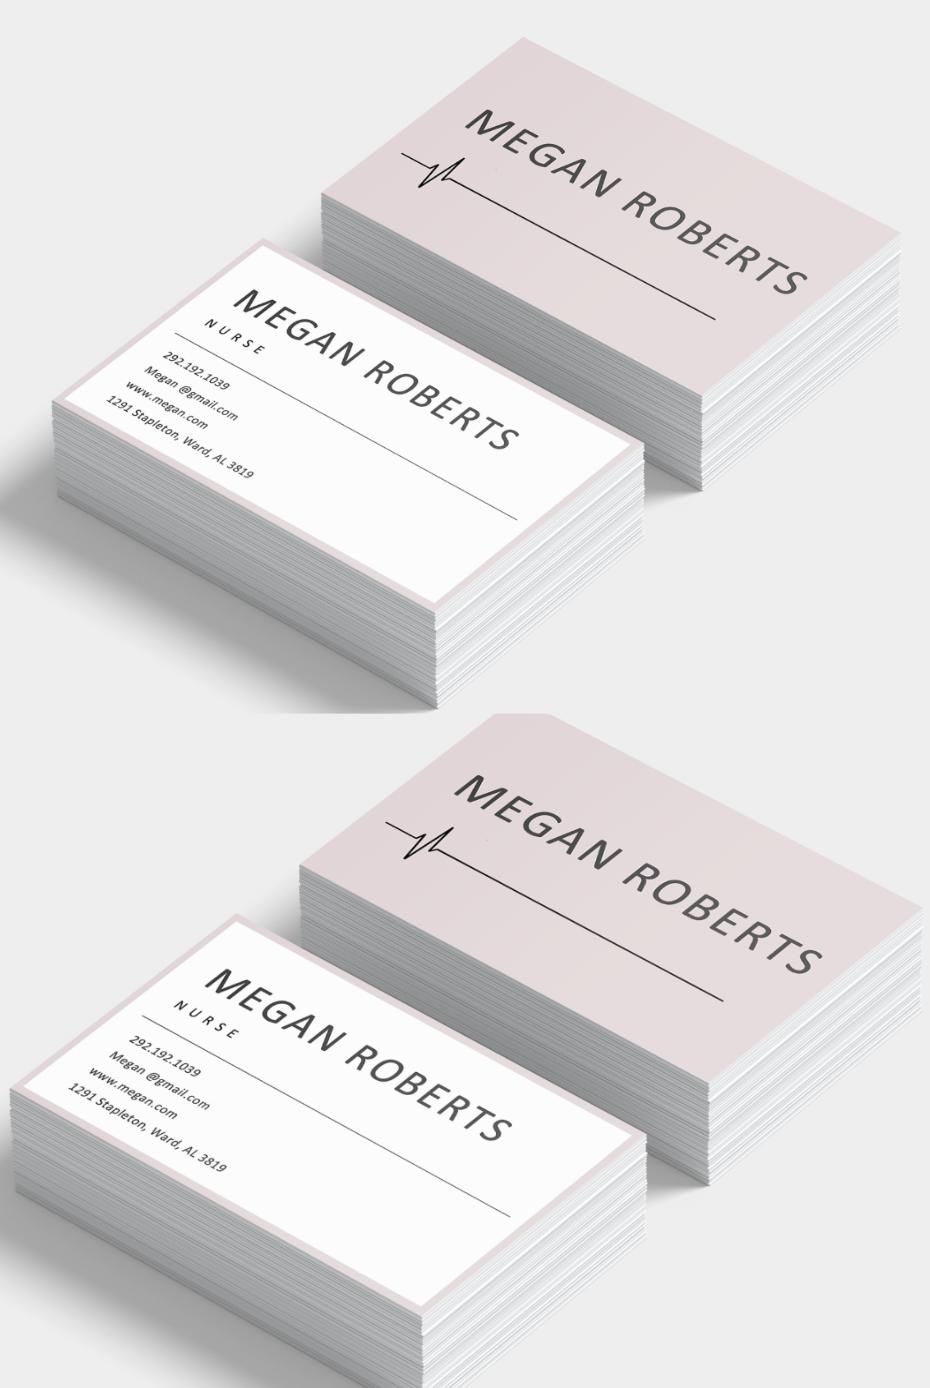 Nursing Business Cards Custom Business Card Custom Business Cards Modern Business Cards Business Cards